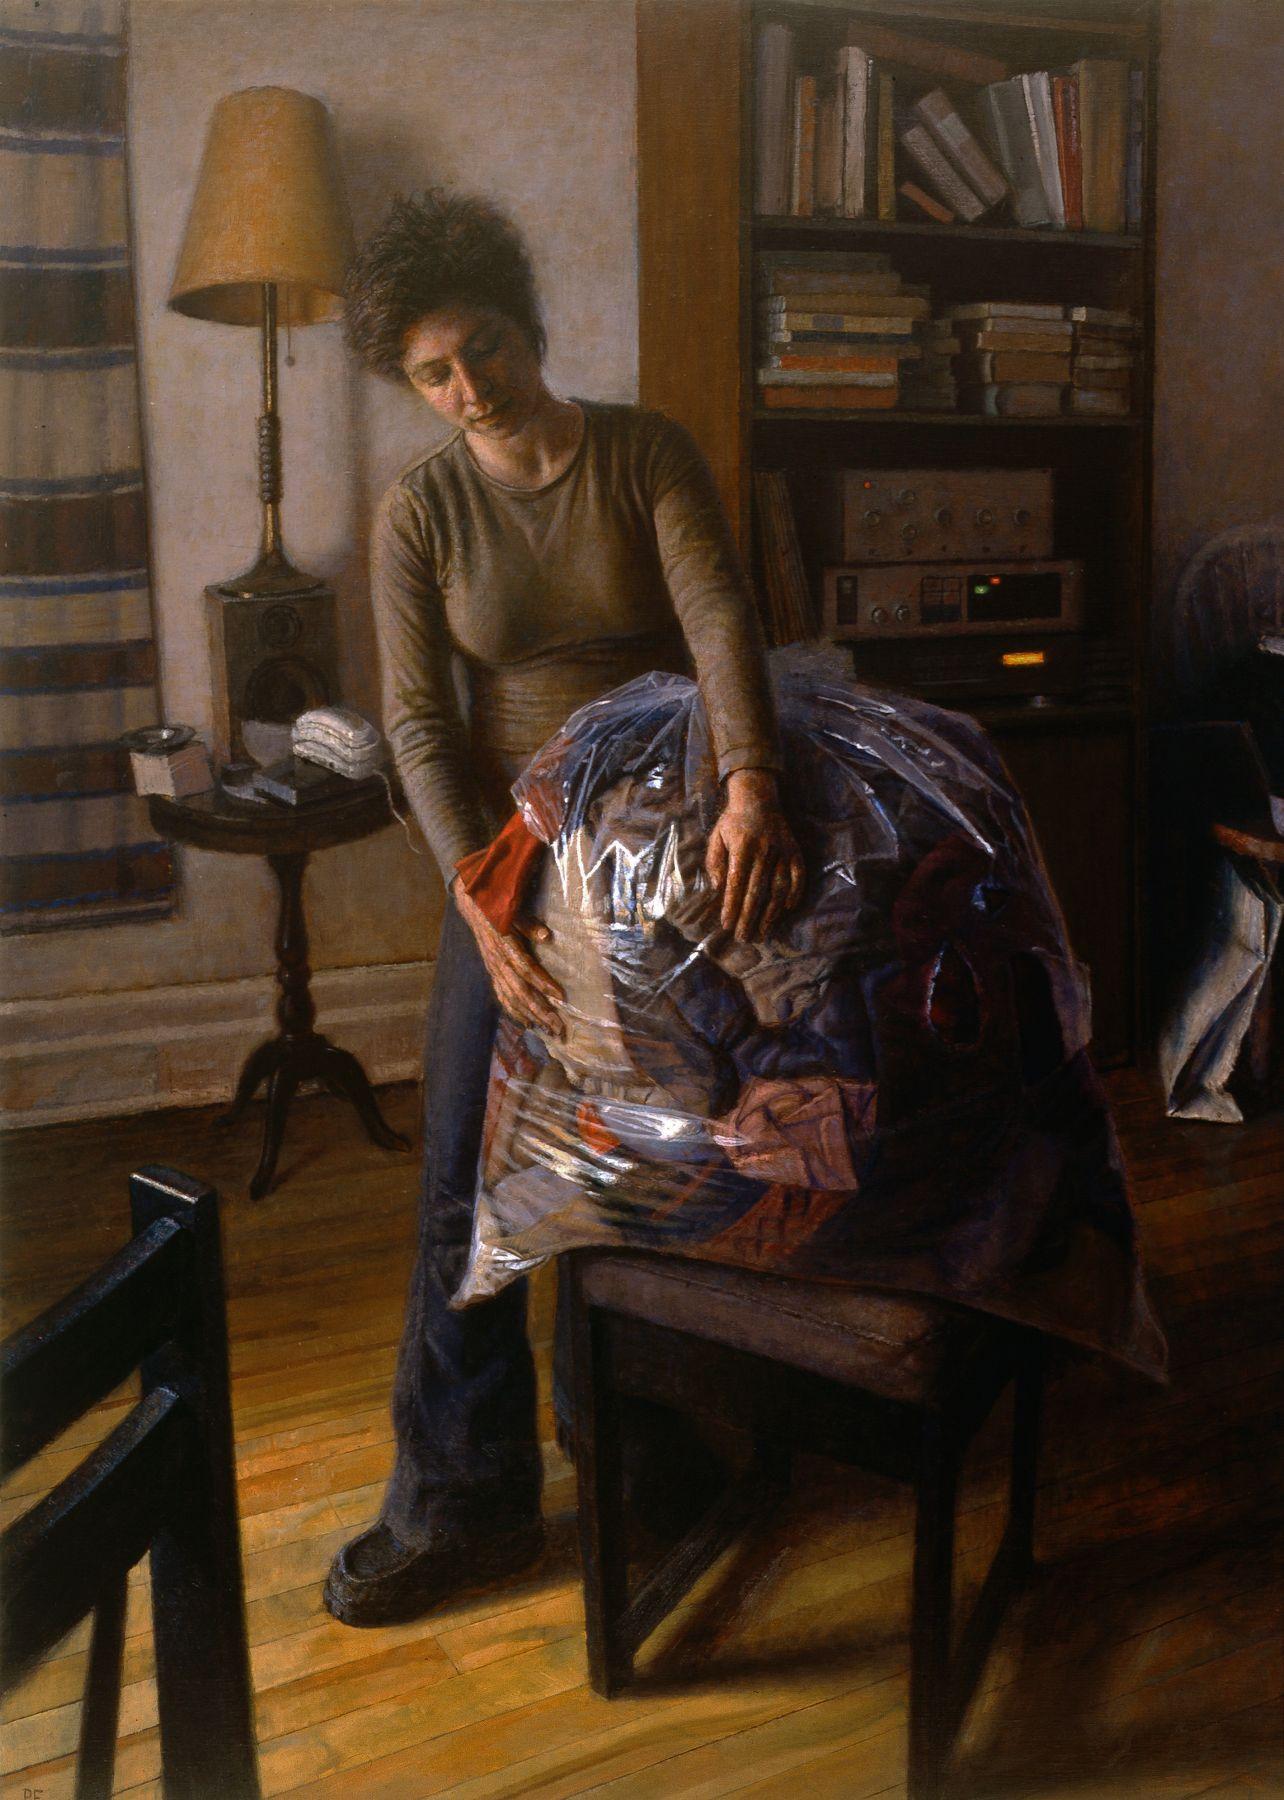 Paul Fenniak, Rupture (SOLD), 2005, oil on canvas, 48 x 36 inches